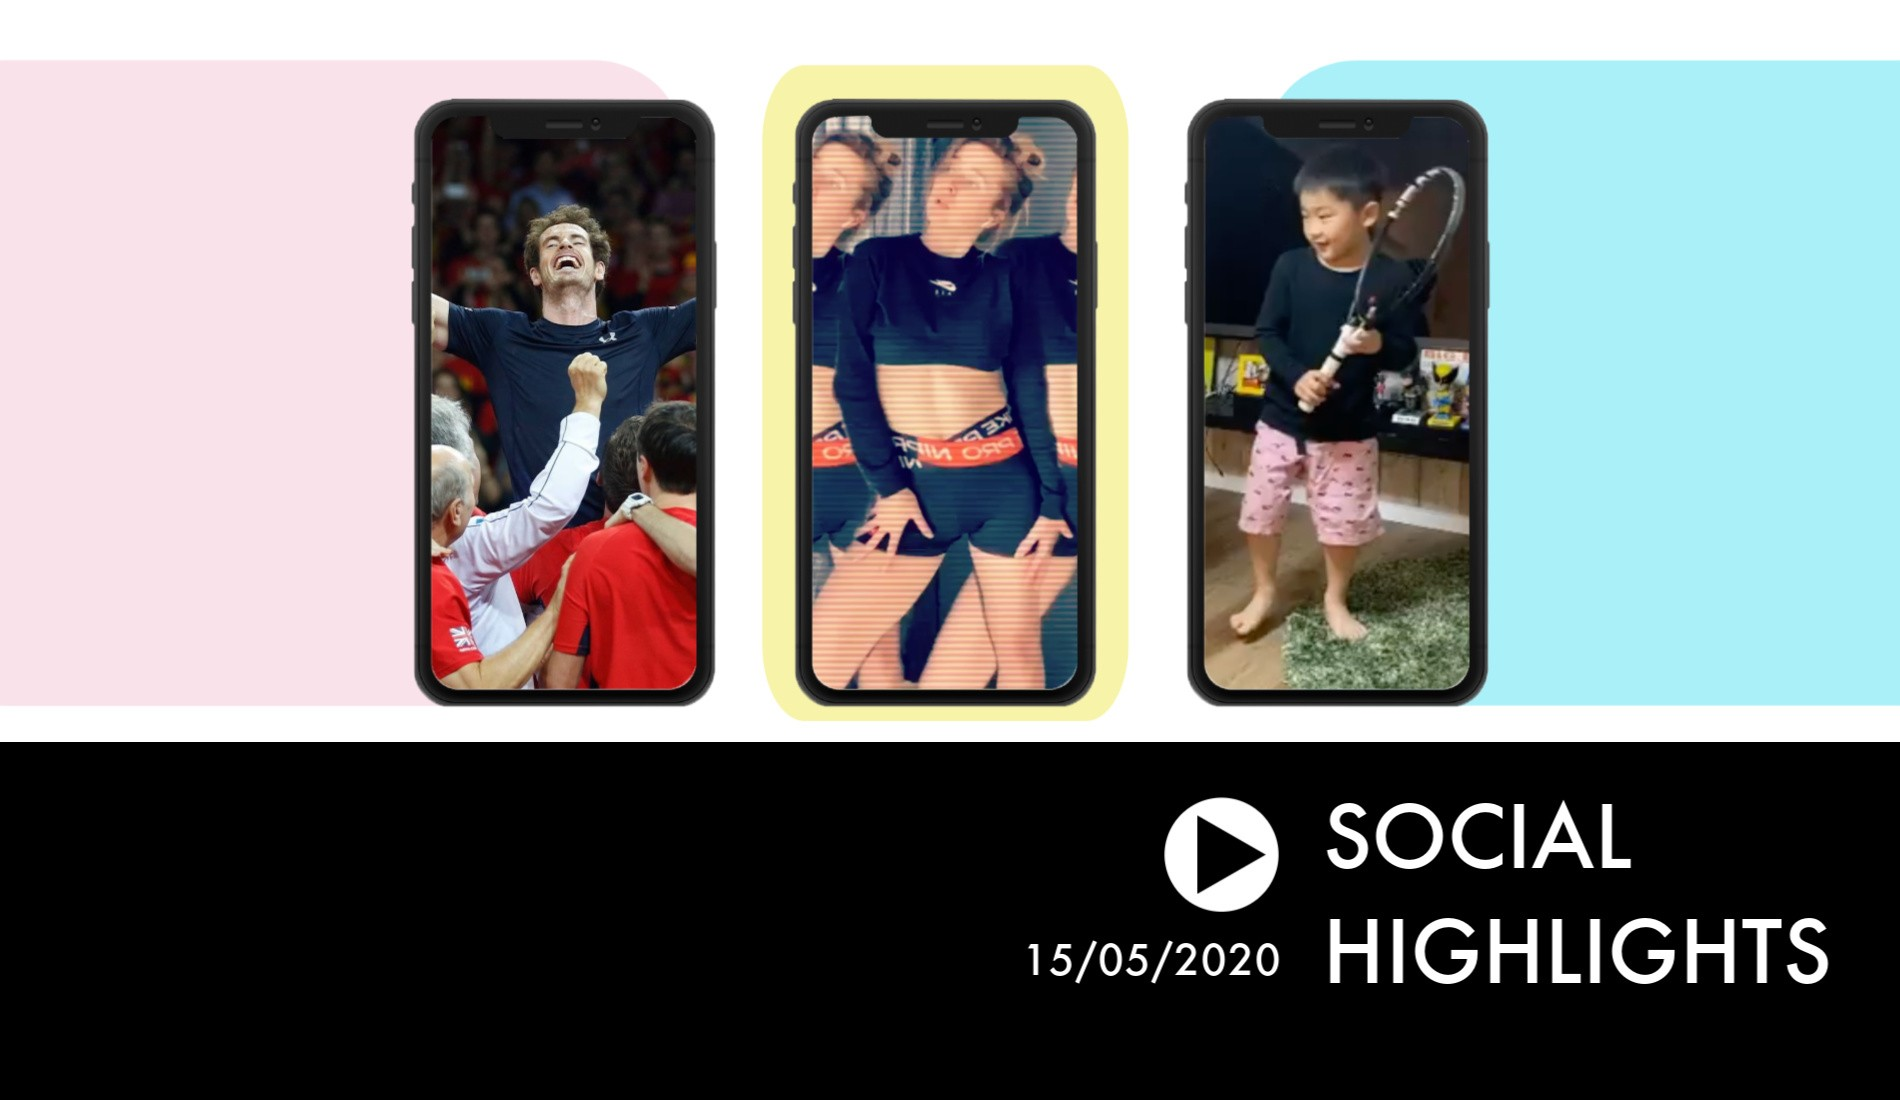 Social Highlights 15.05.20 -  Happy Birthday Andy Murray